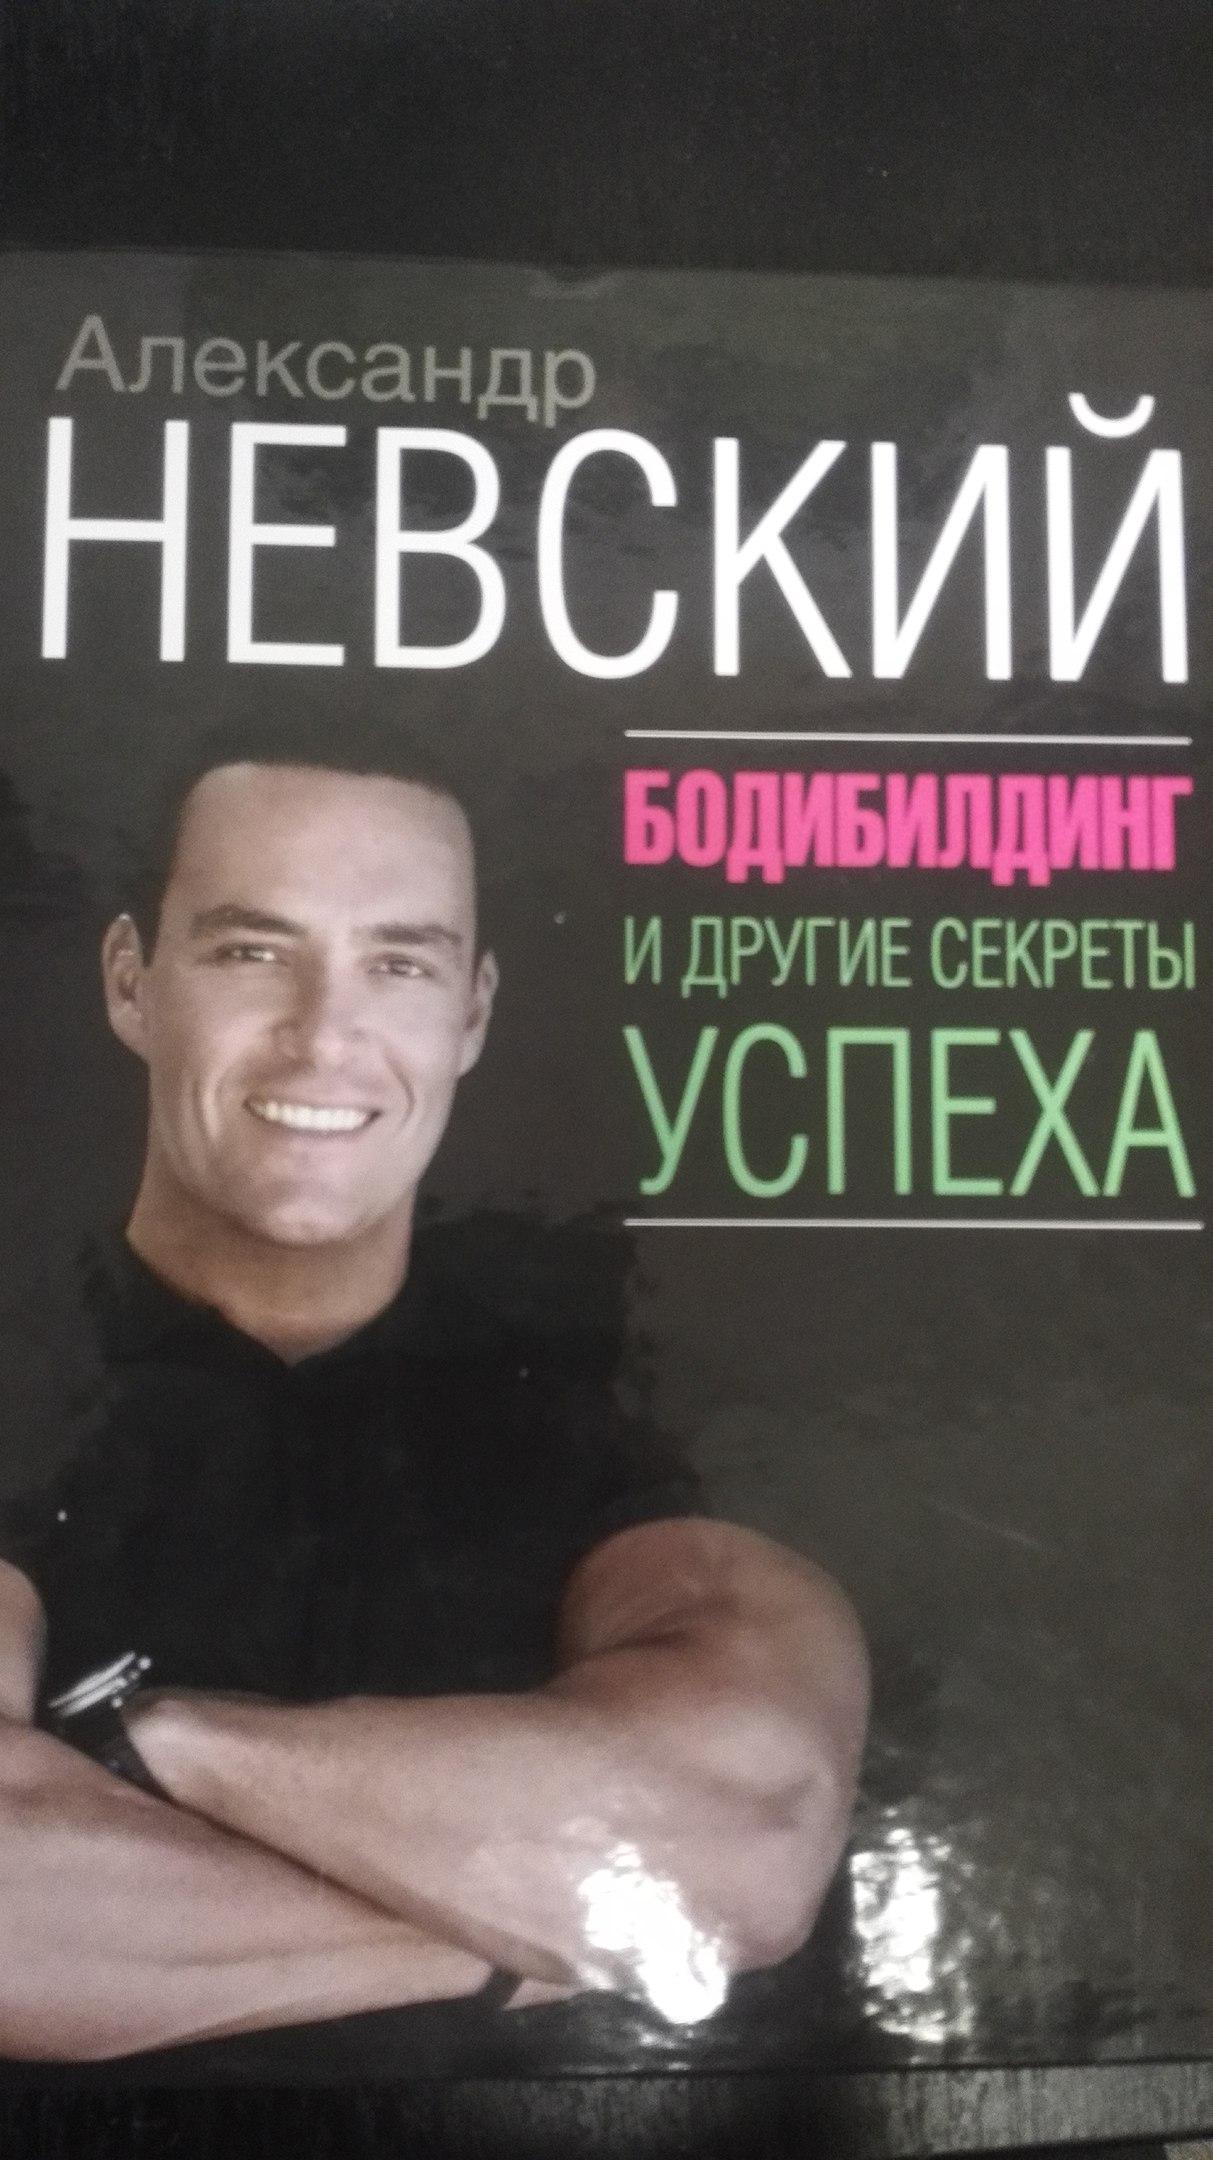 K9khSRQEiV8.jpg